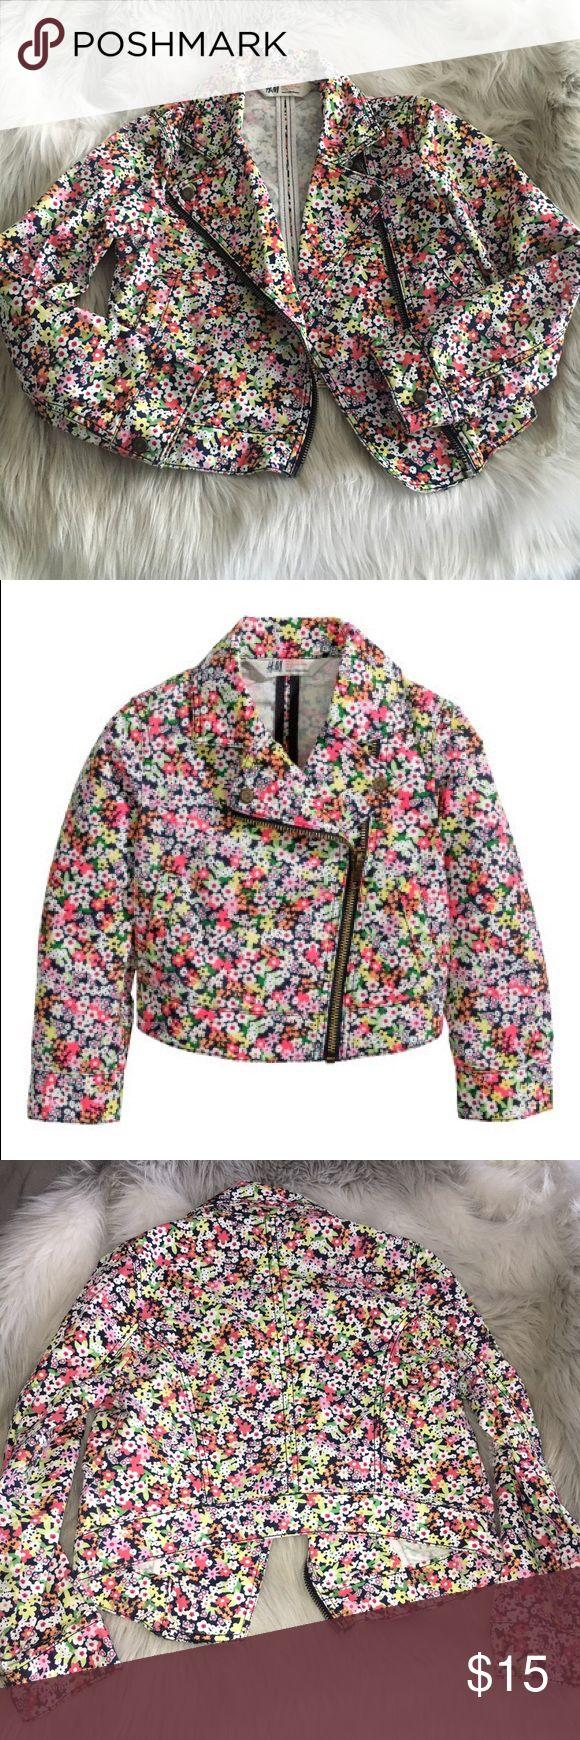 Kids Floral Biker Jacket 🌸🌺🌼 Super cute floral zip up bikers jacket from H&M kids line 🌼🌺🌸 Size 5/6 H&M Jackets & Coats